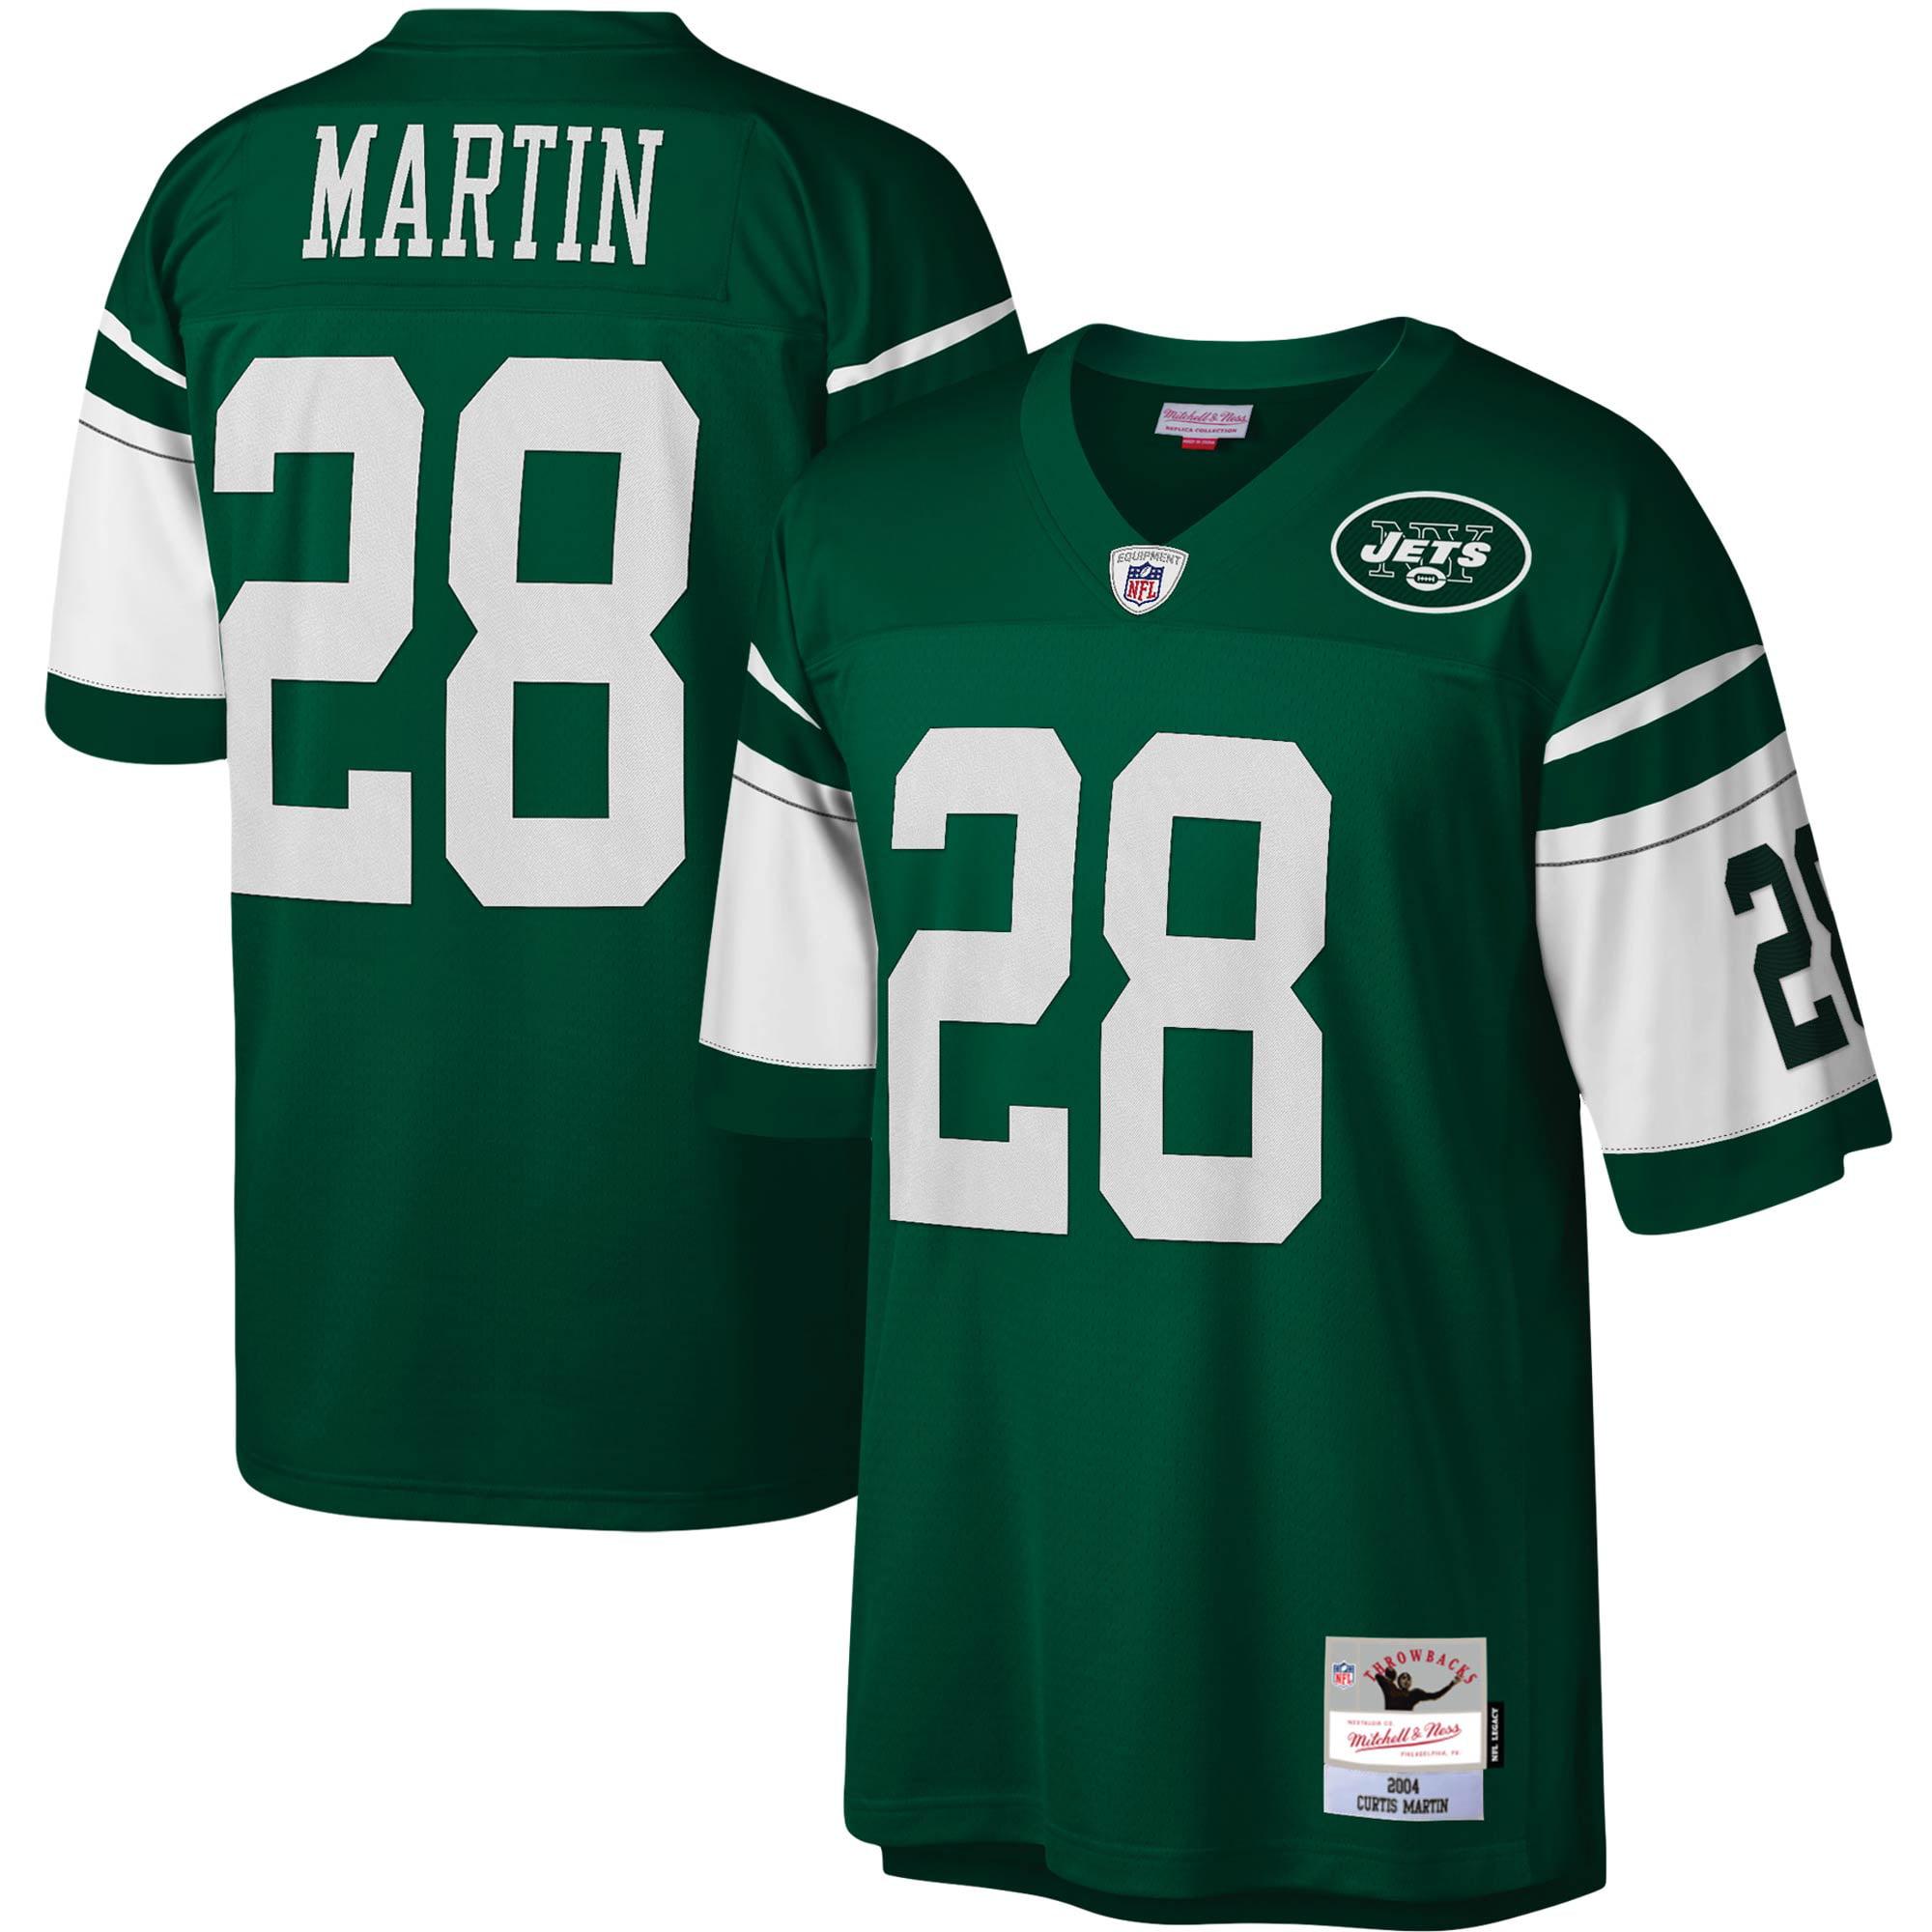 Curtis Martin New York Jets Mitchell & Ness Legacy Replica Jersey - Green - Walmart.com